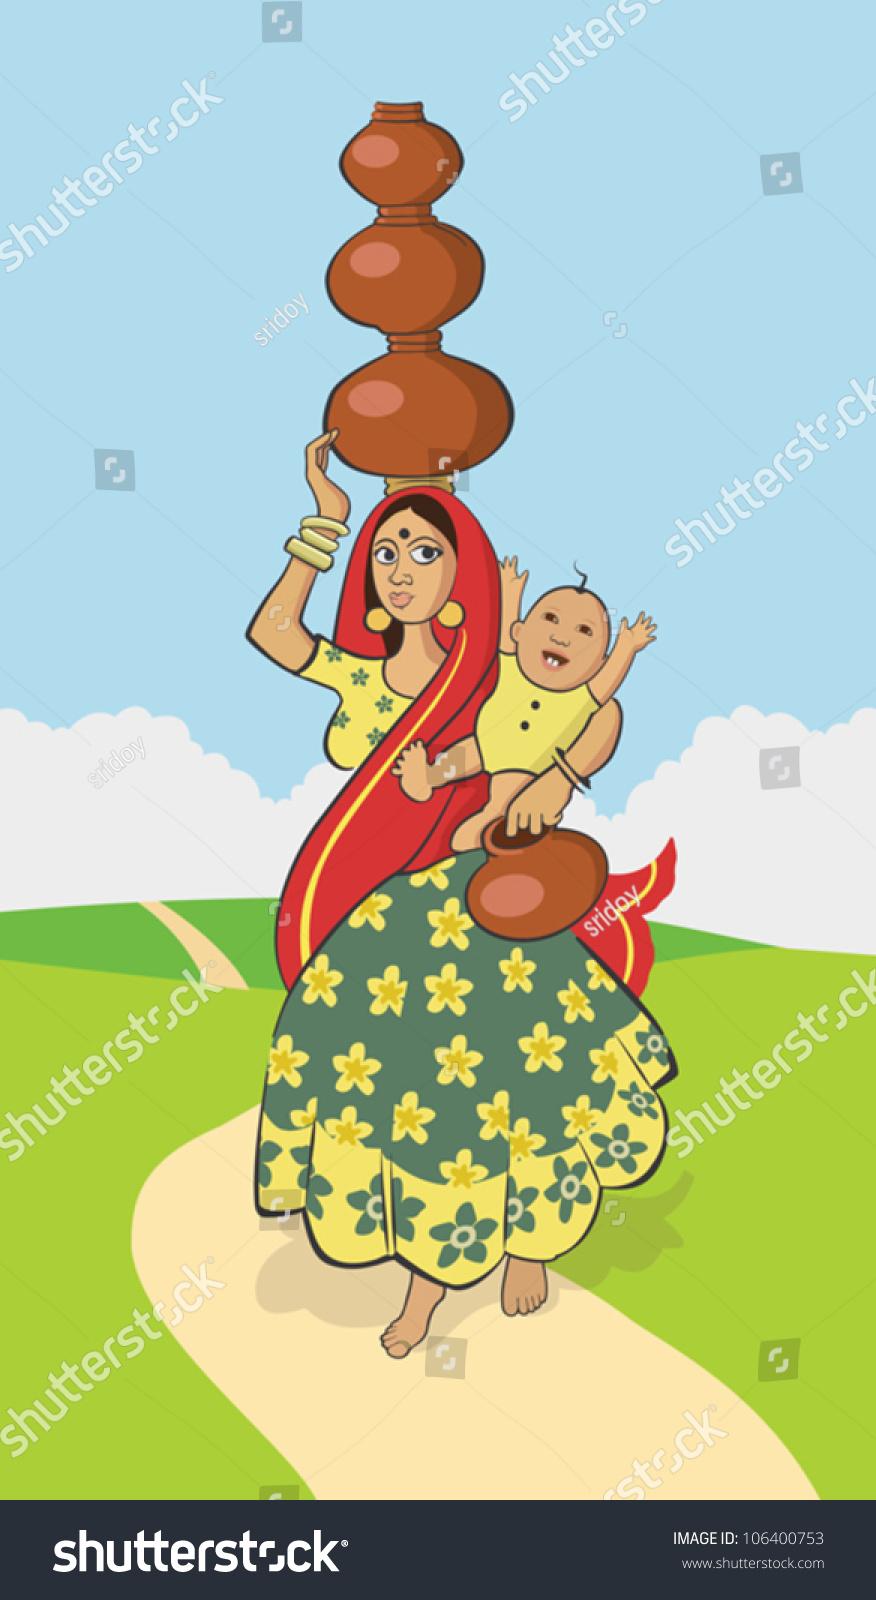 Indian village women hot dance songs